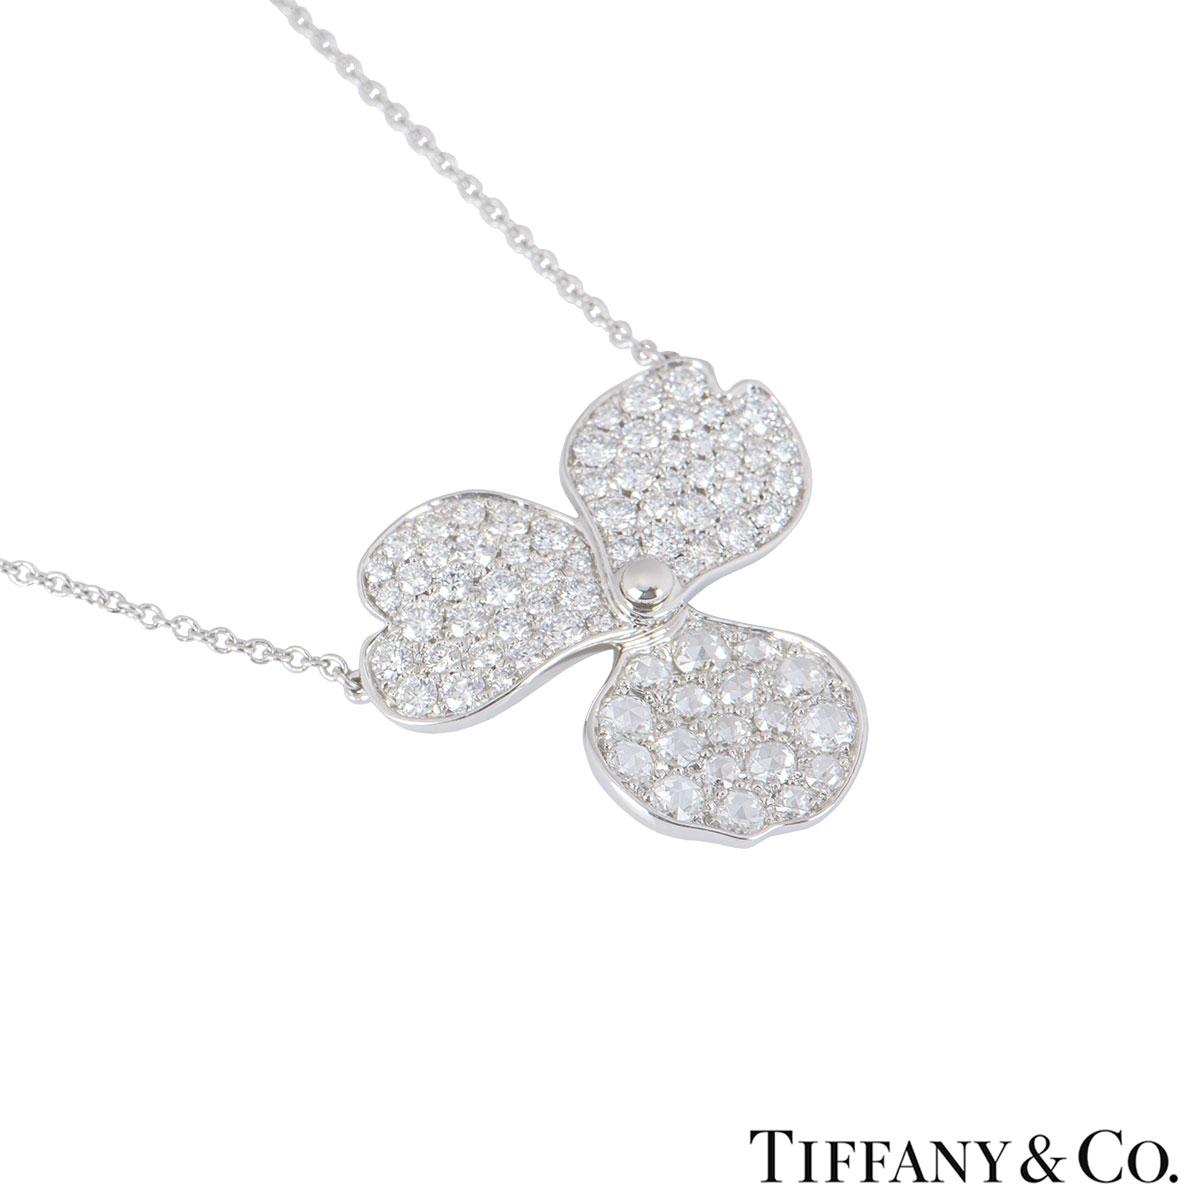 Tiffany & Co. Platinum Diamond Paper Flowers Pendant